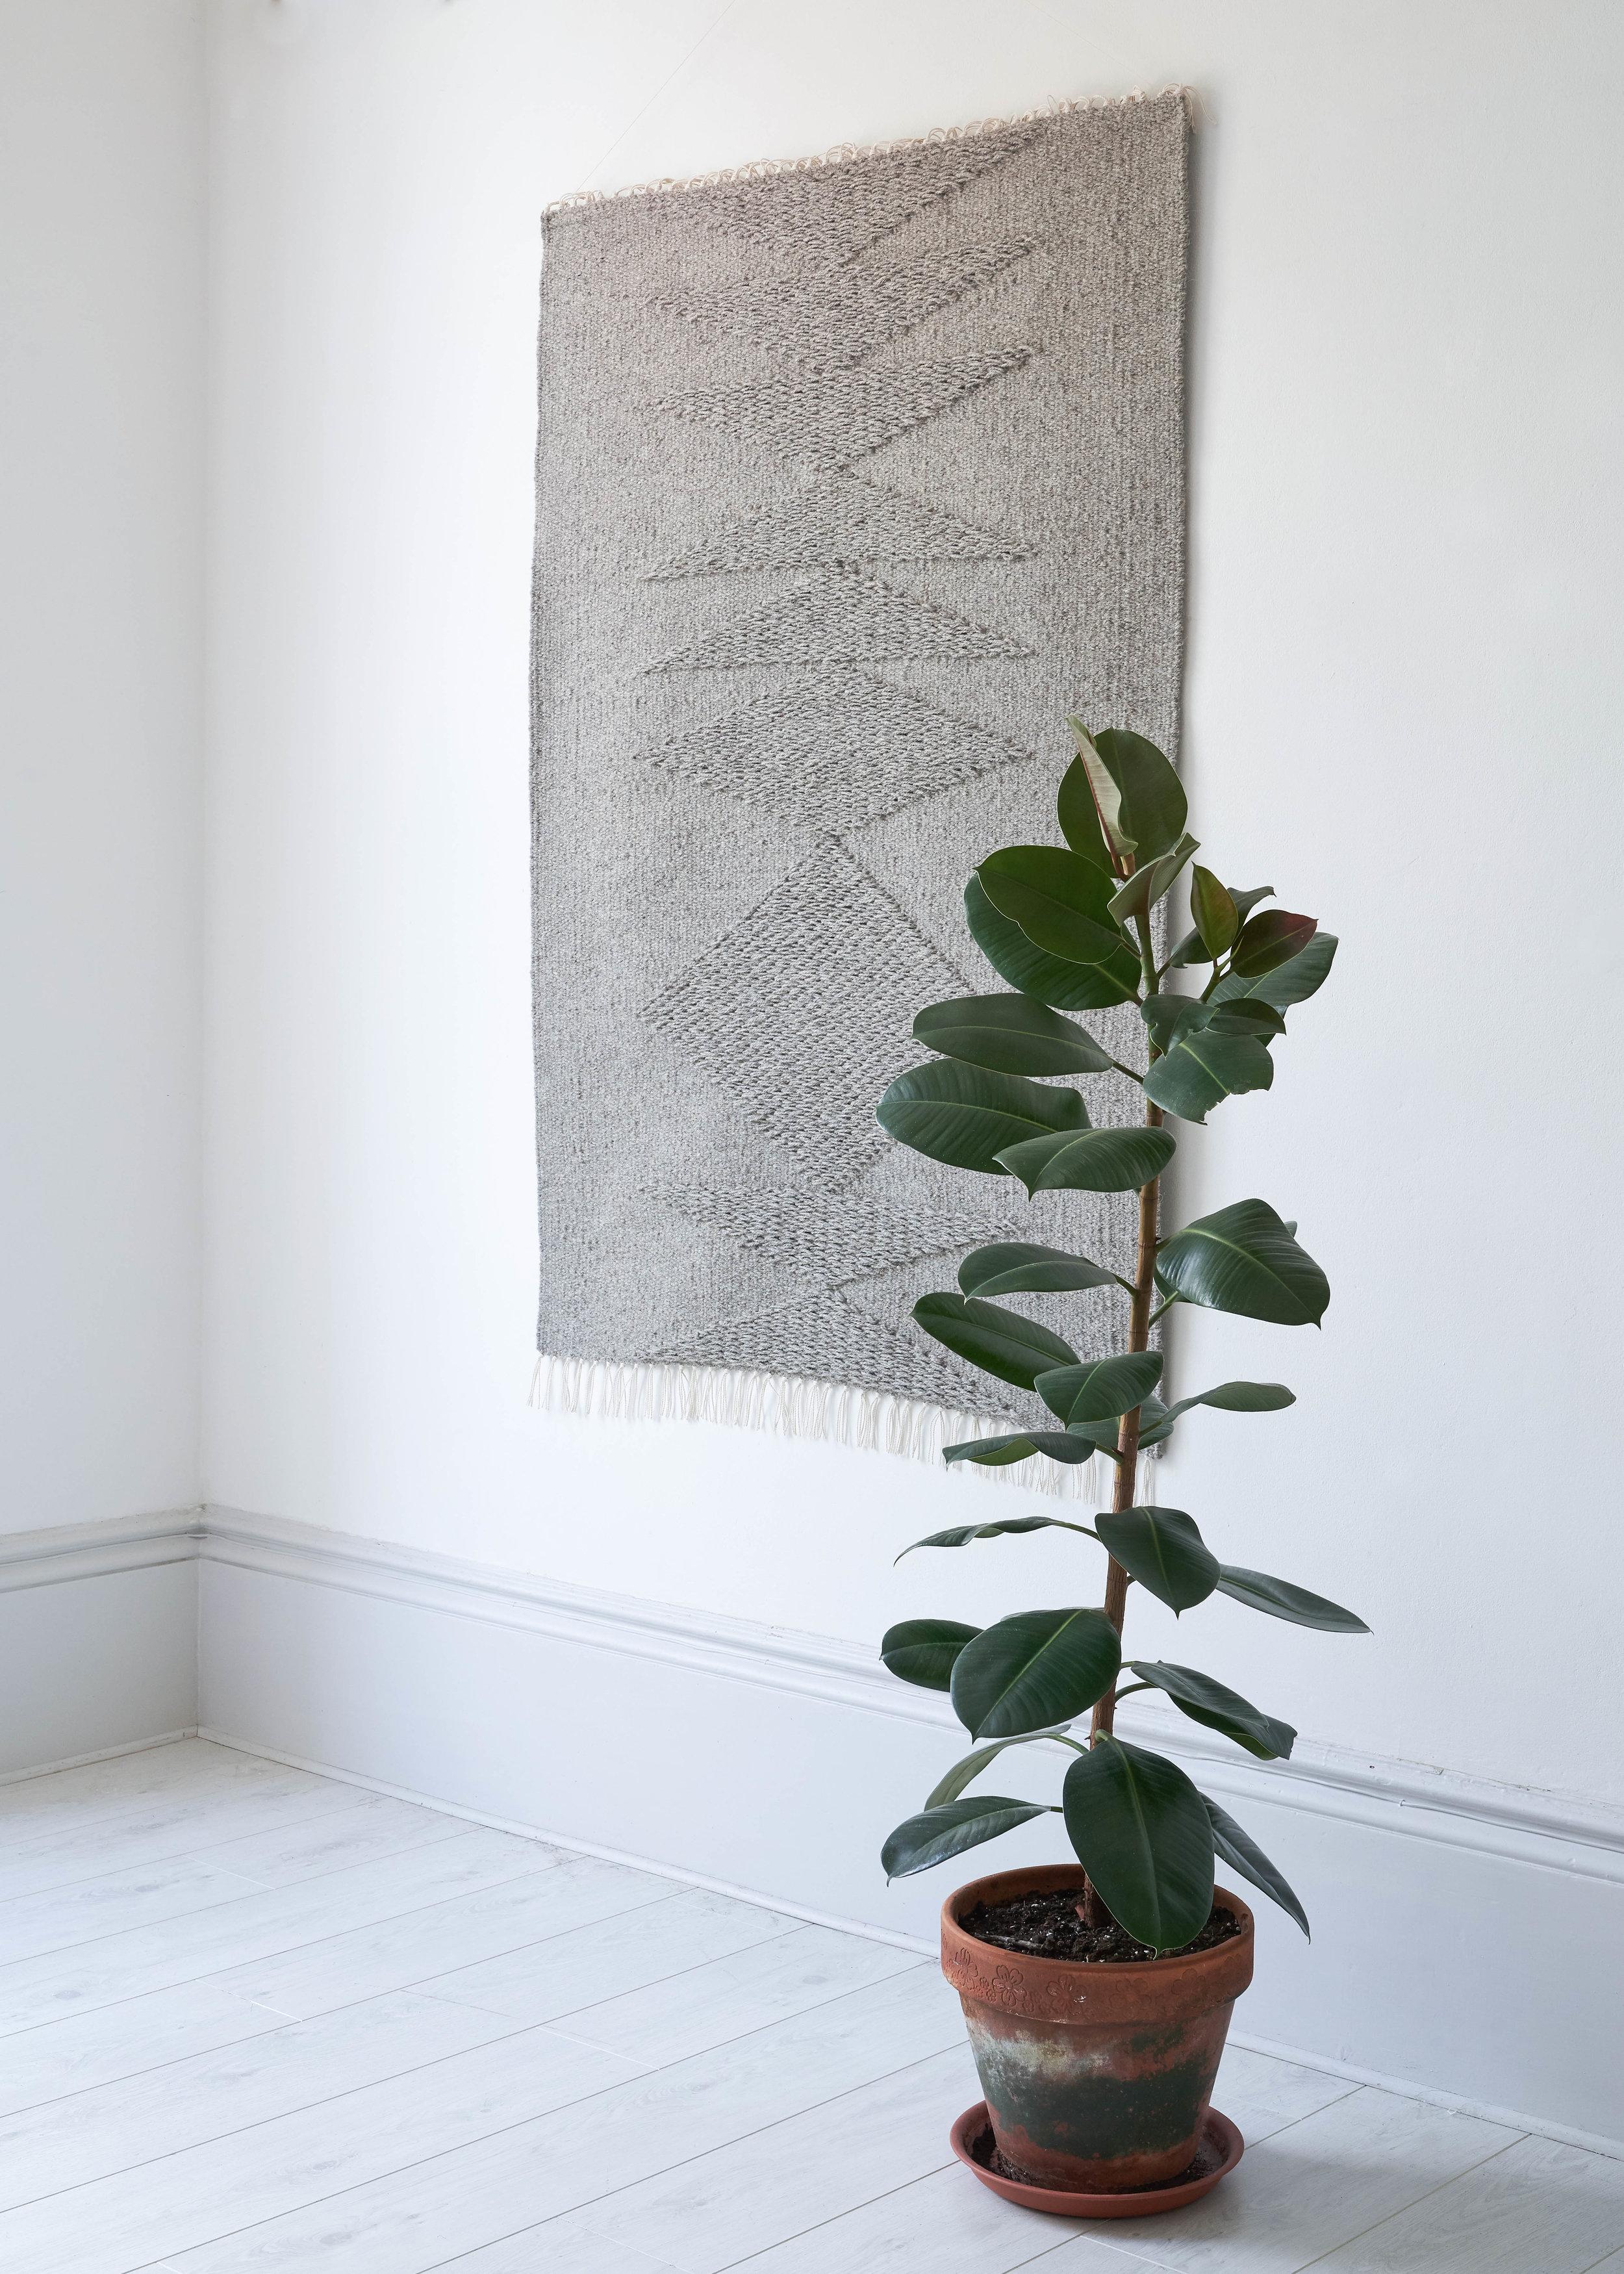 Christabel-Balfour-Concrete Lifestyle 002.jpg